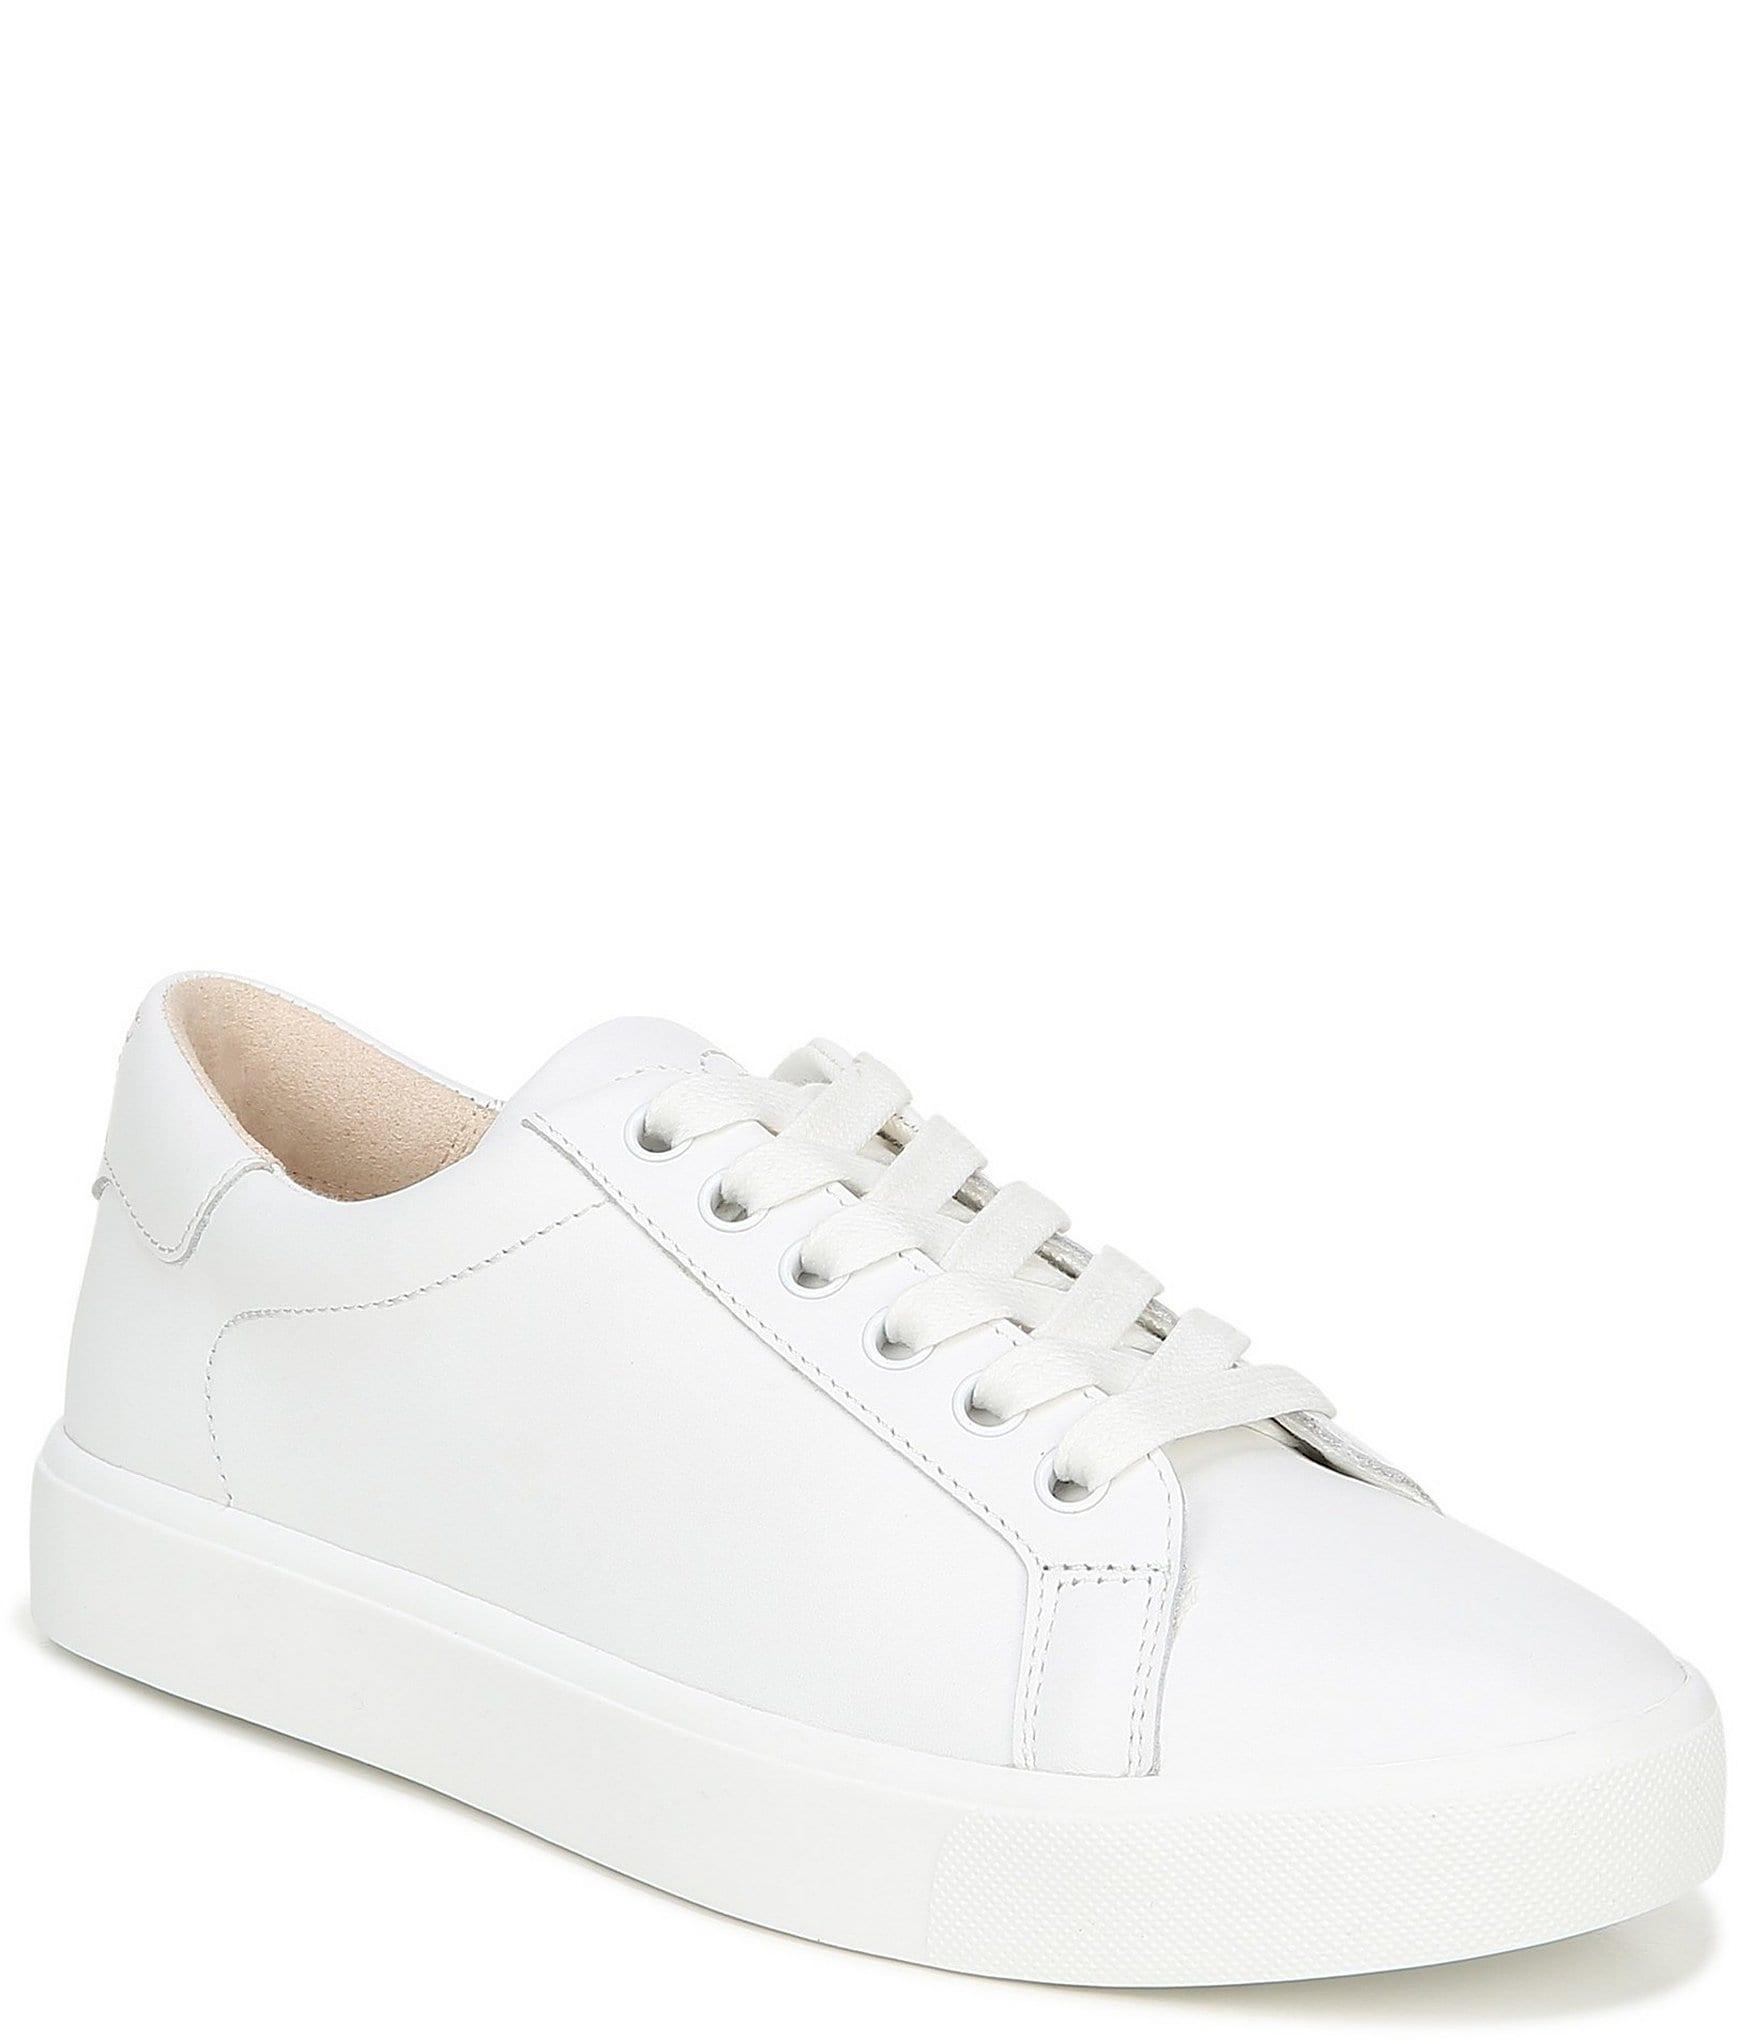 Sam Edelman Women's Sneakers | Dillard's